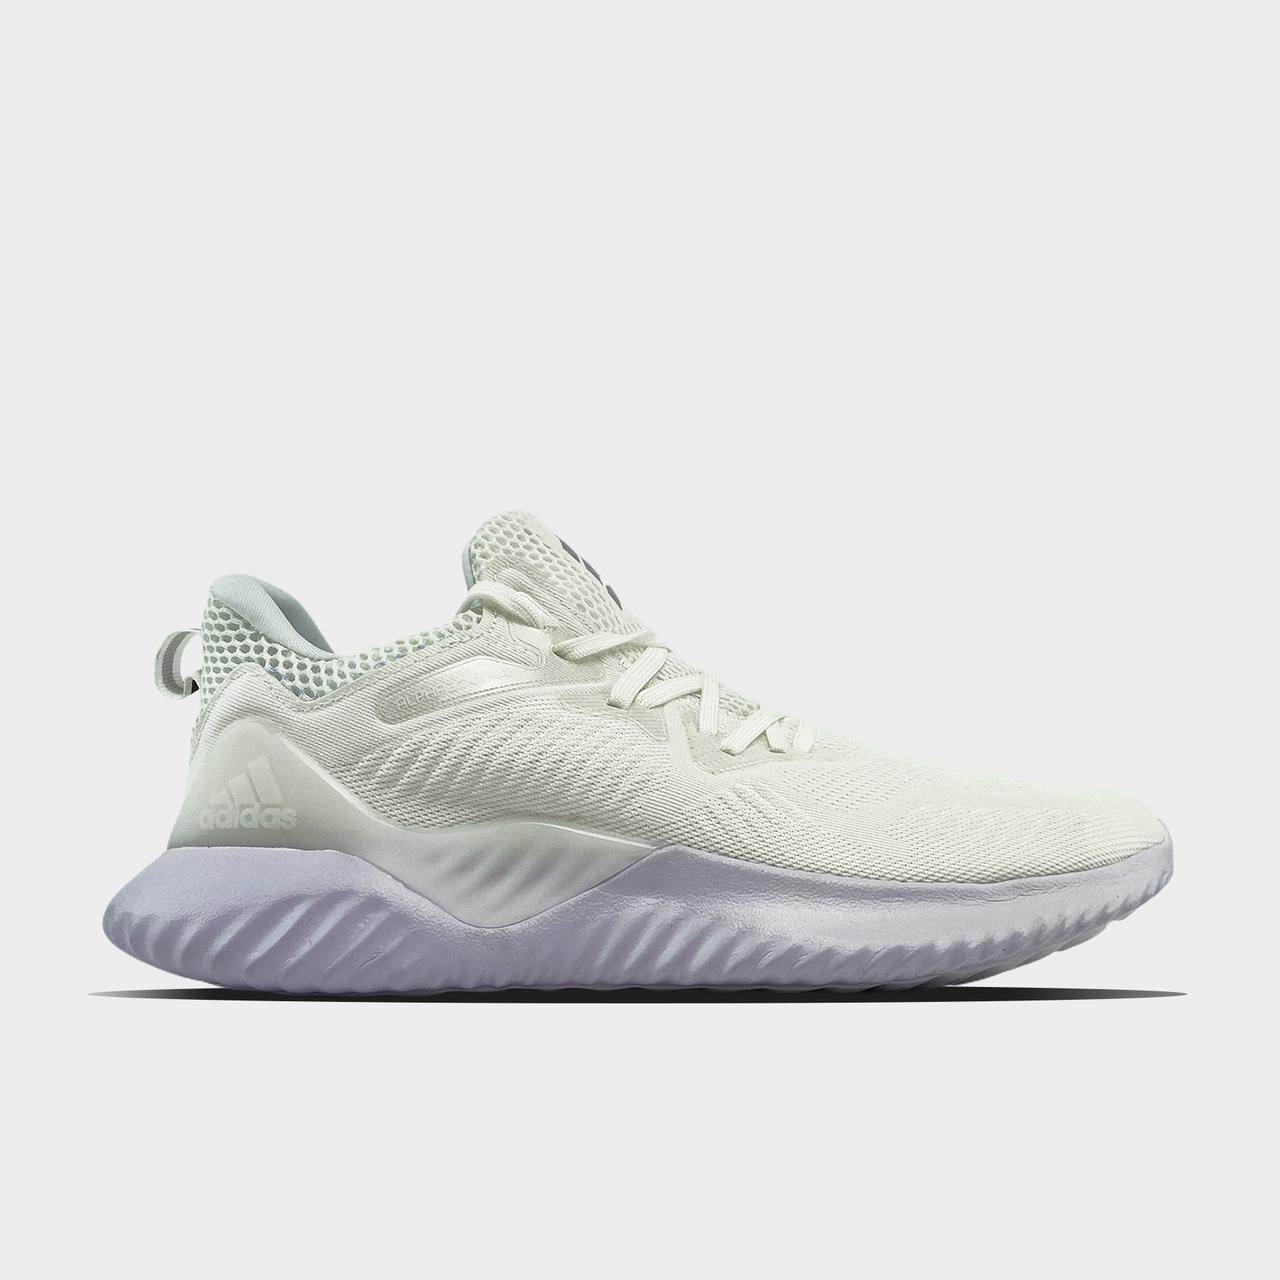 Ad!id@s, крос, обувь, взуття, sneakers, шузы, Alpha Bounce Instinct White (Белый)